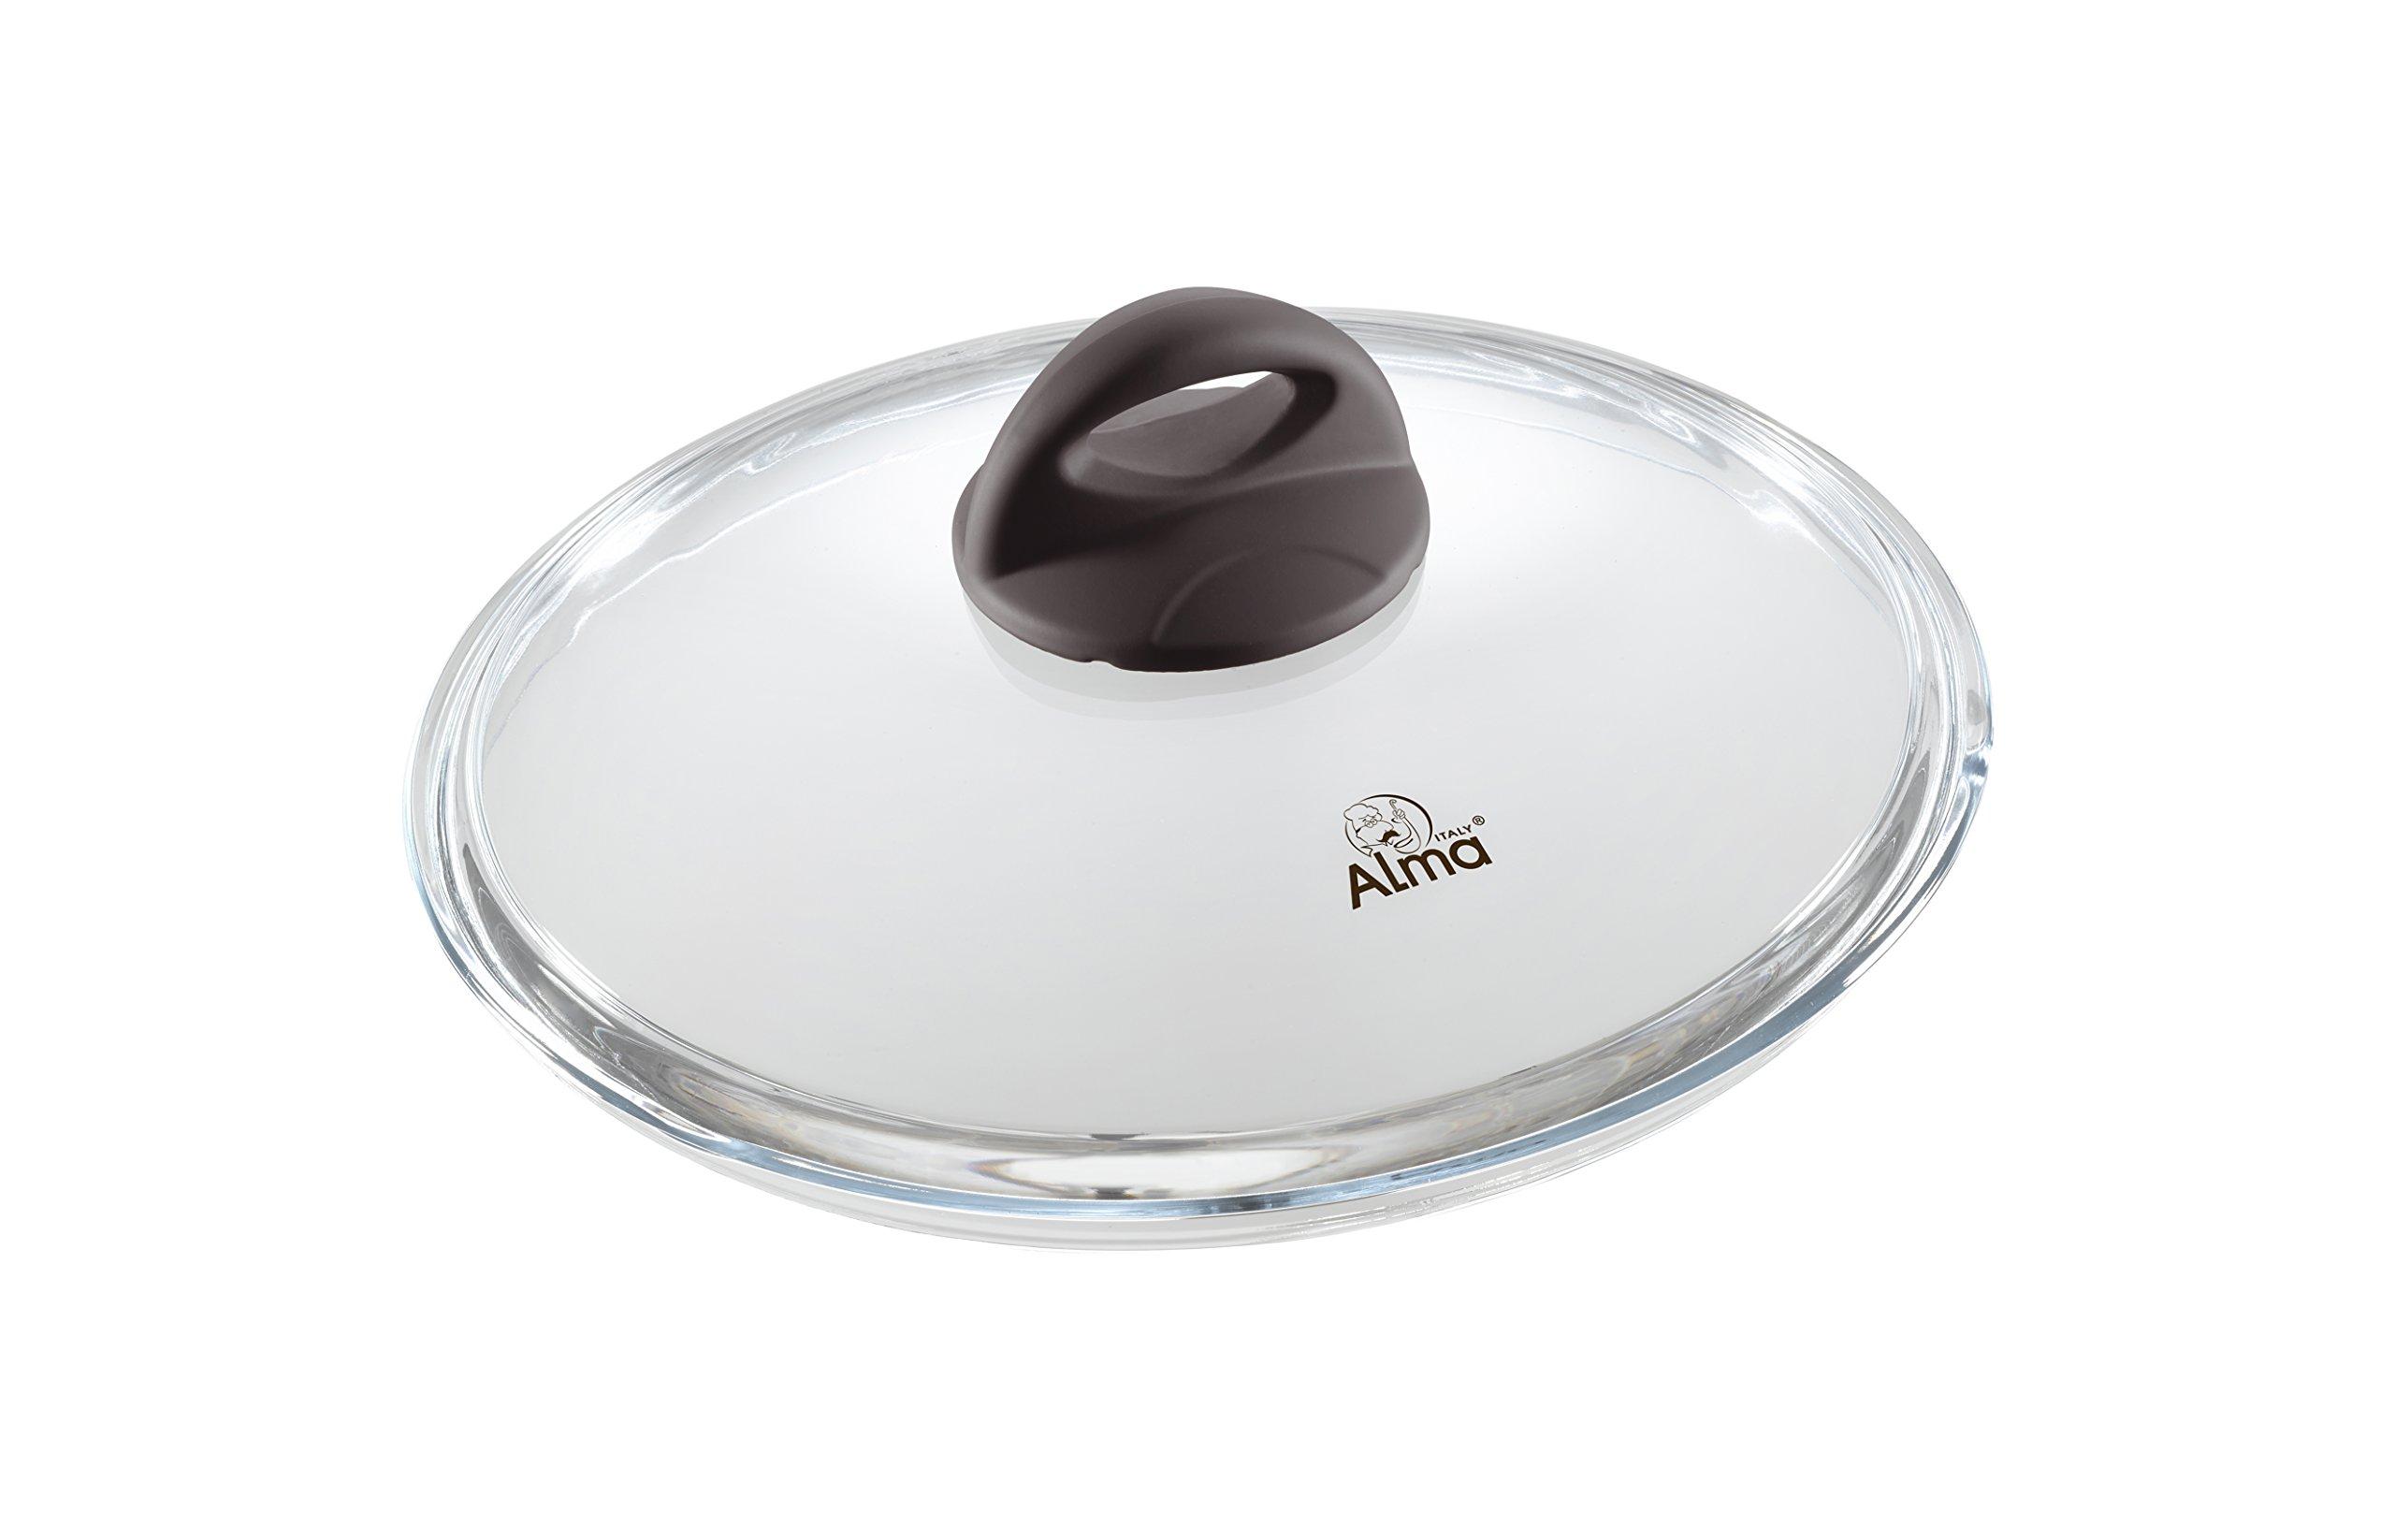 ALMA Cookware Egizia, Borosilicate Glass with Soft Knob, Borosilicate Glass, Brown, 20 cm